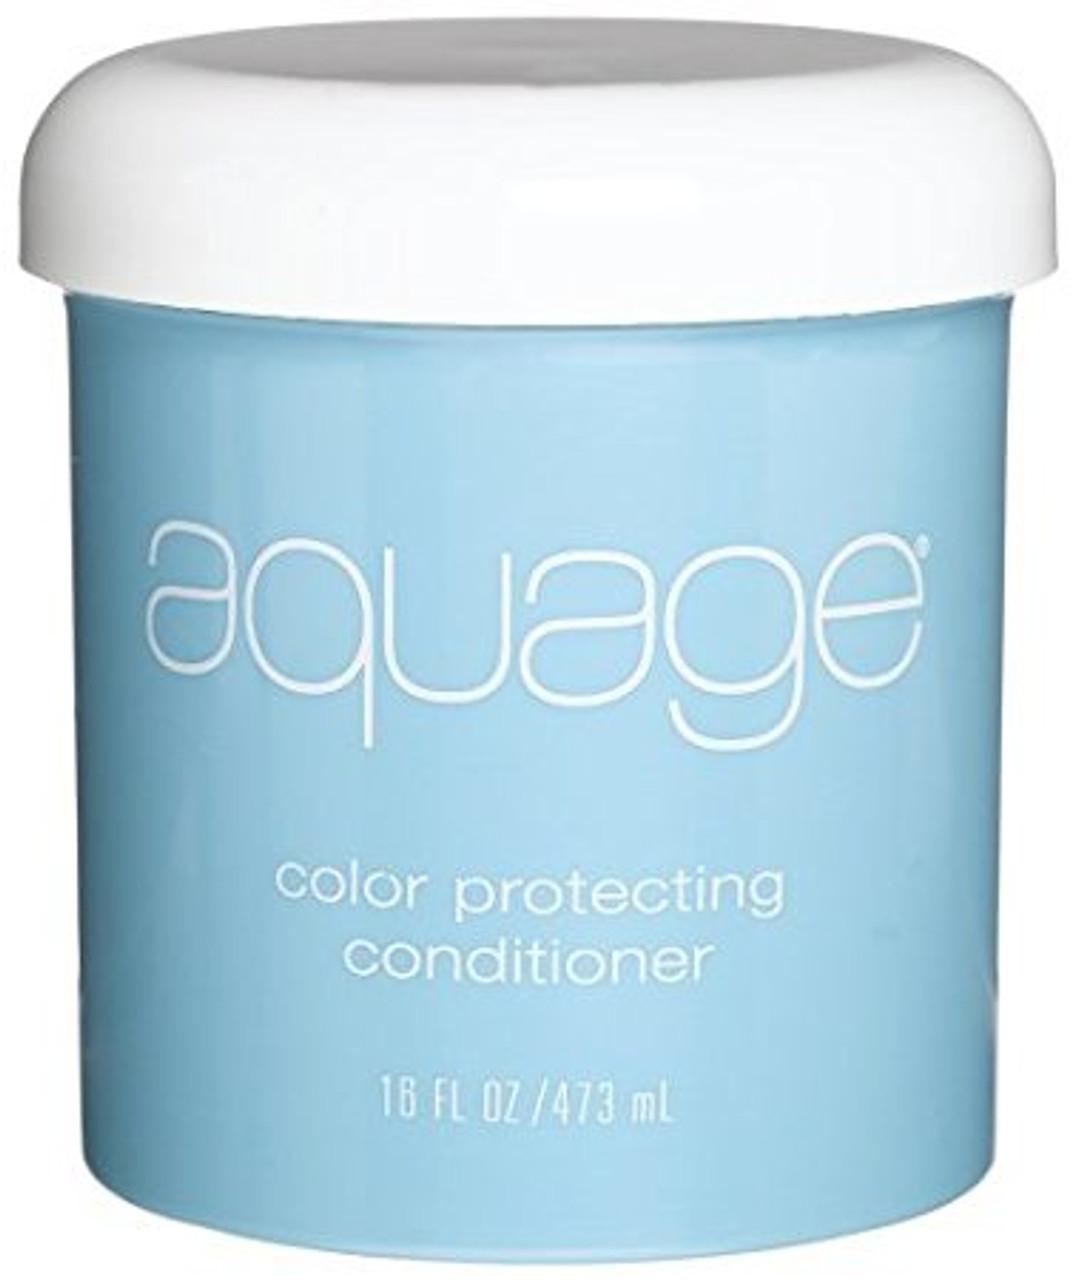 Aquage Color-Protecting Conditioner, 16 oz